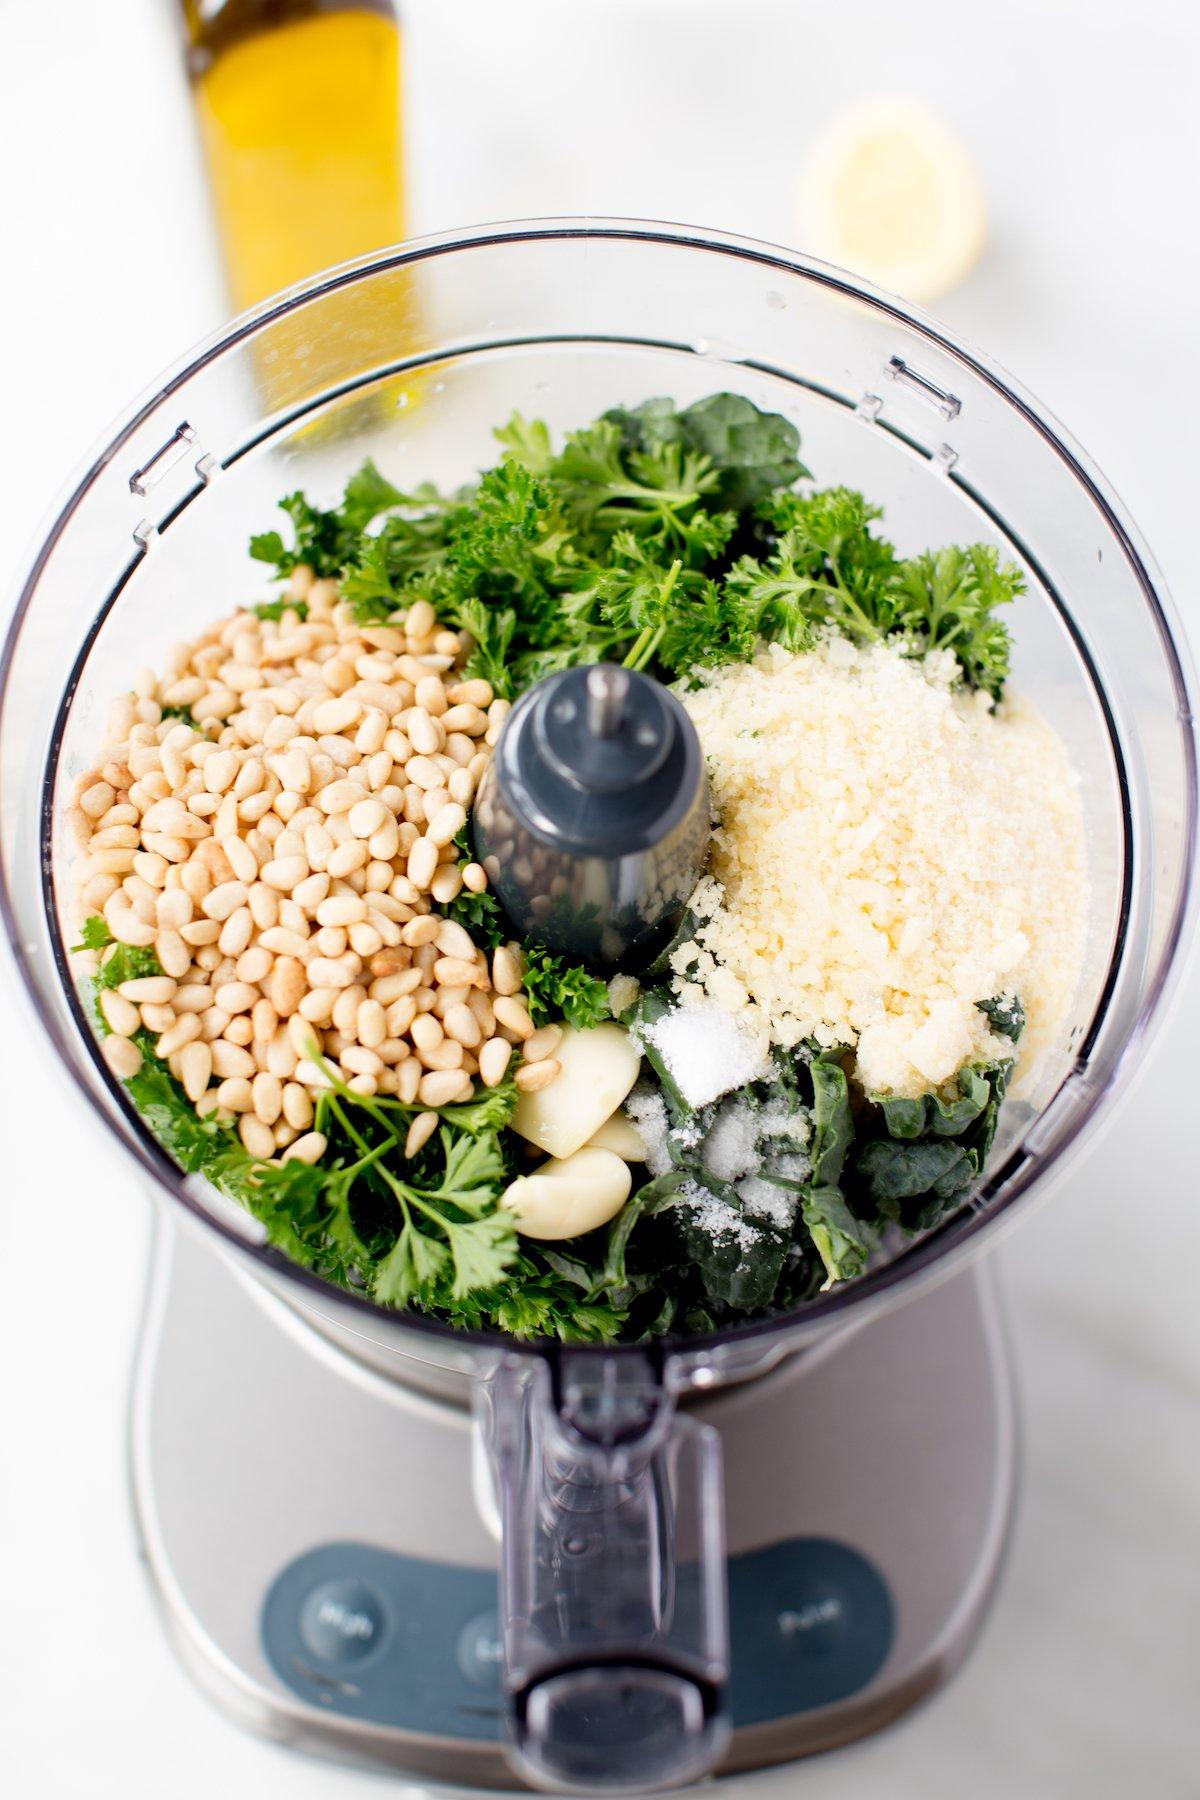 ingredients for kale pesto in food processor